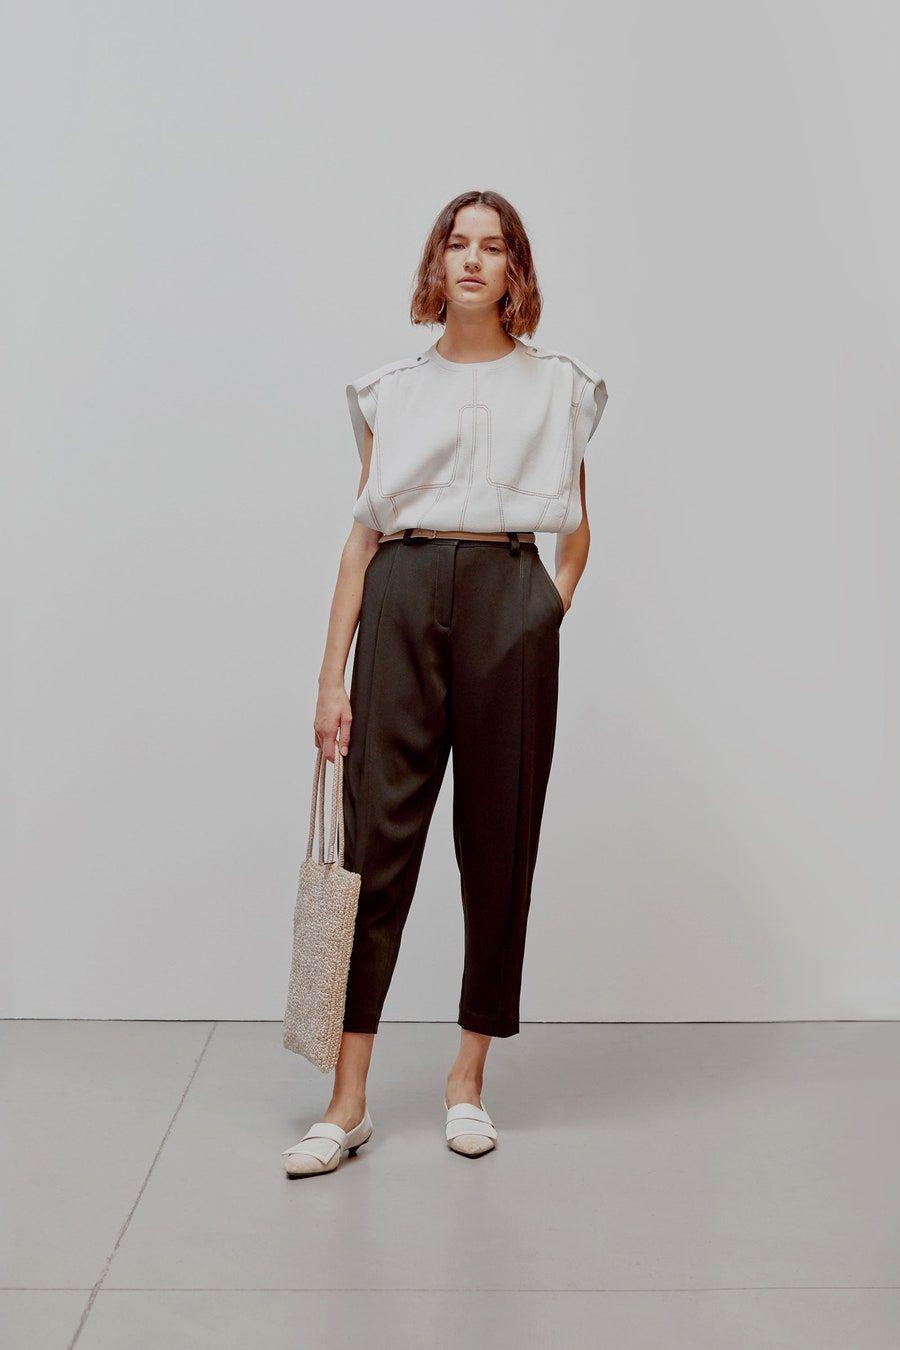 Anteprima Spring 2021 Ready-to-Wear Fashion Show -